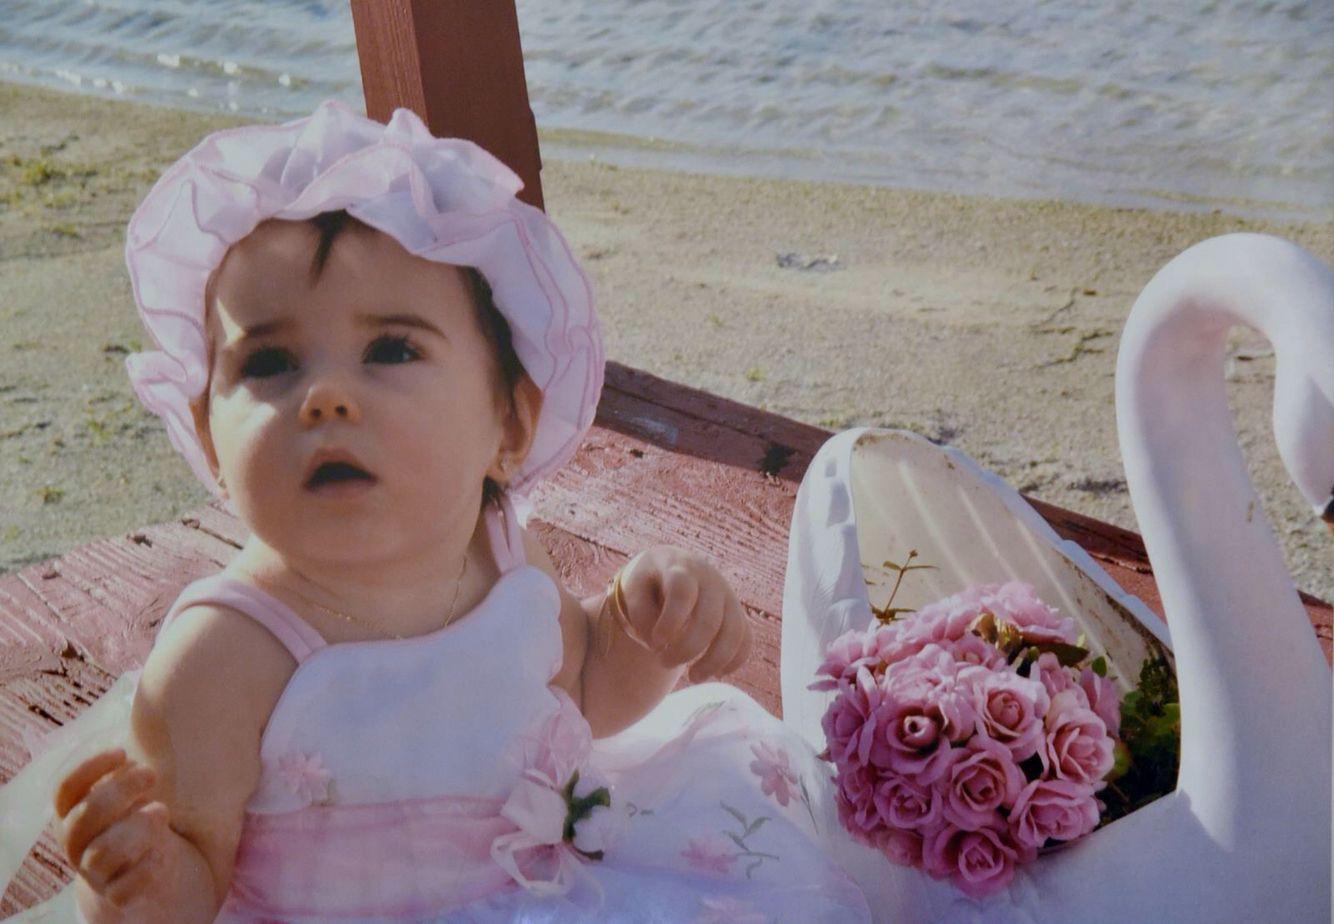 Cumpleaños #1 #LudyMorejonPictures #Baby#Classical